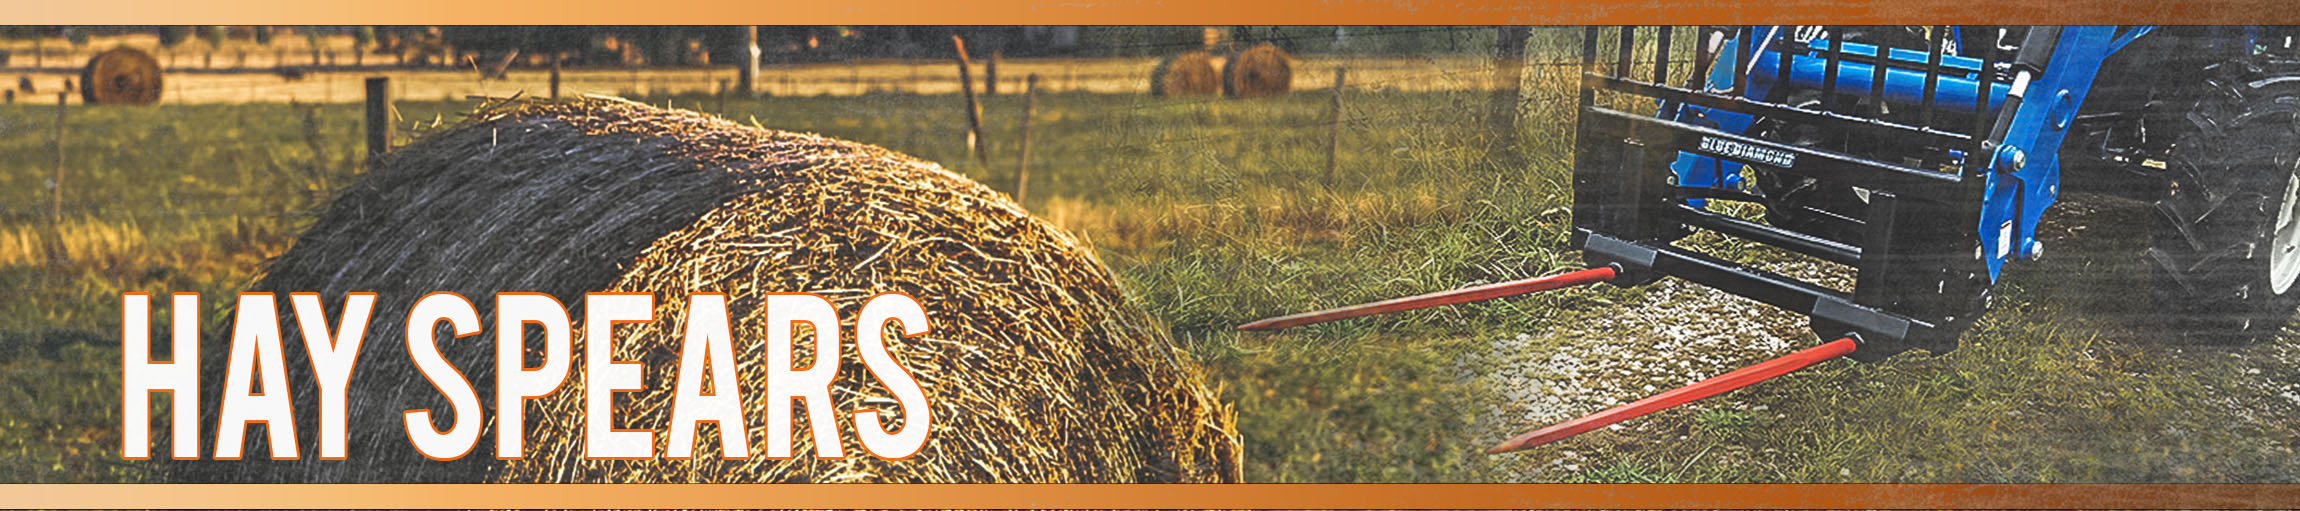 Hay & Forage Attachments for Farm Equipment